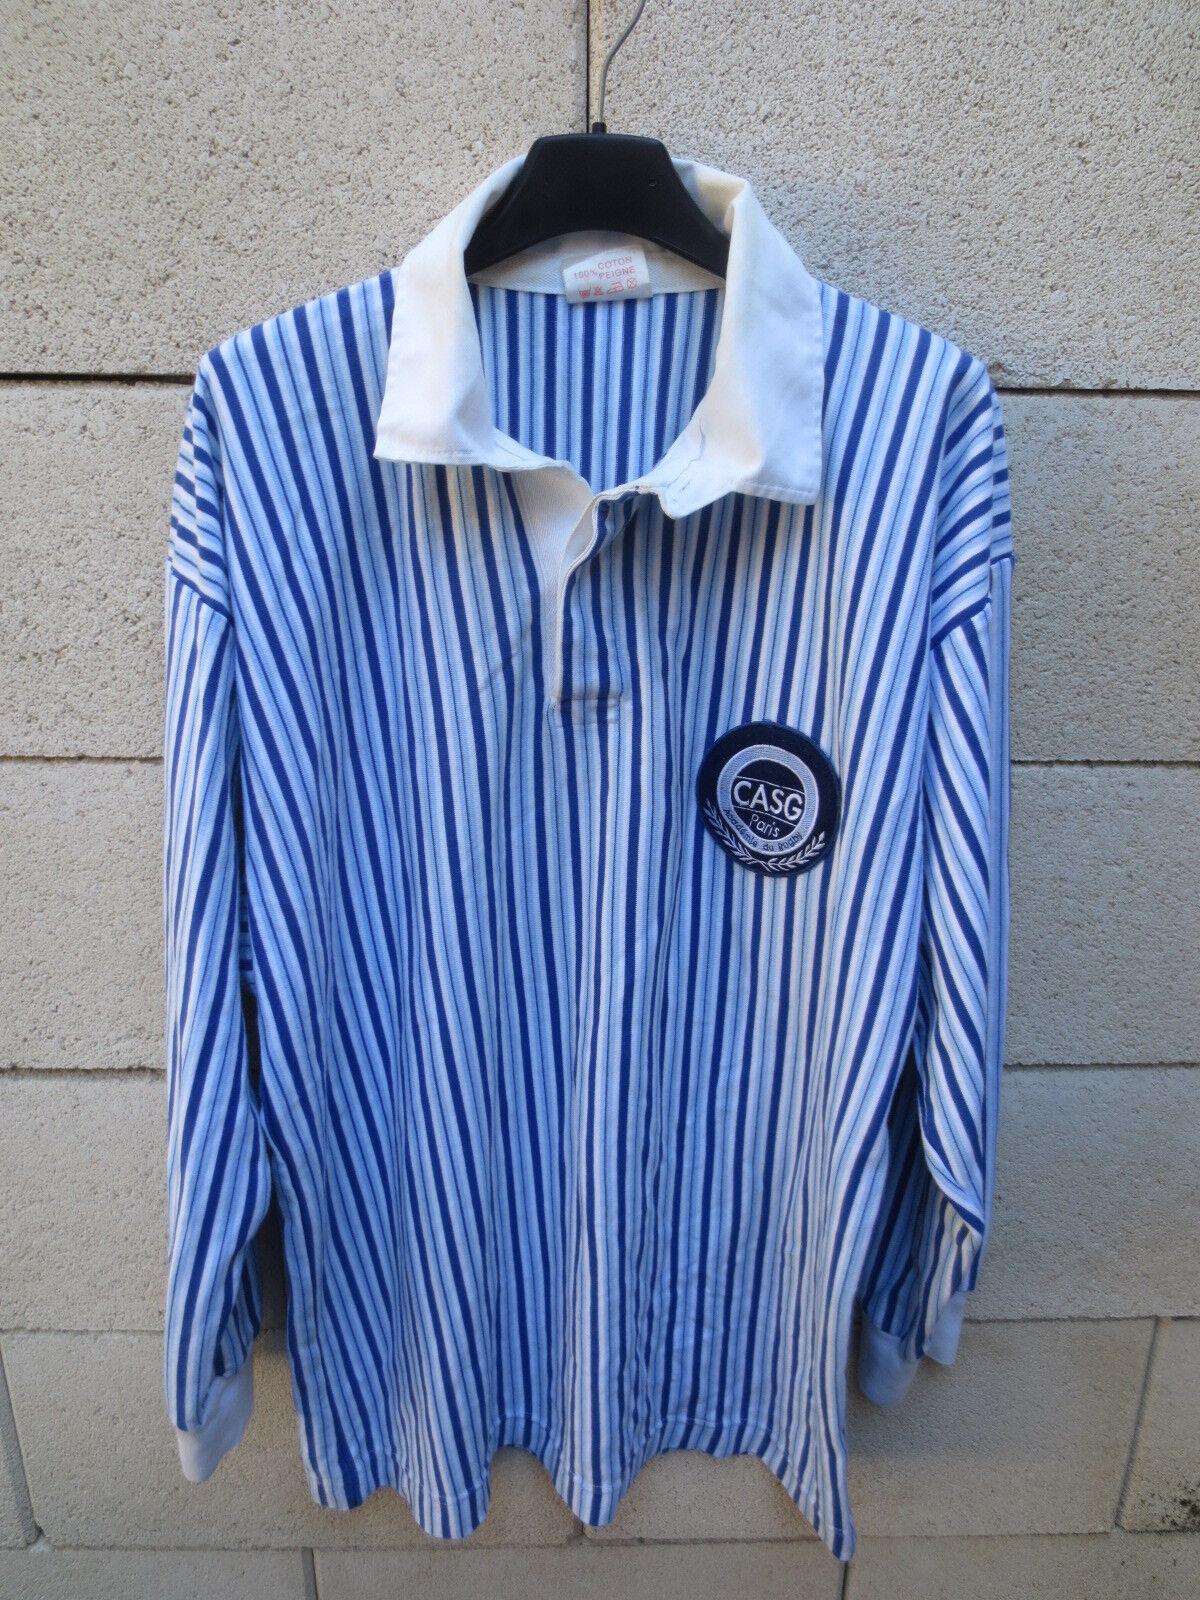 VINTAGE Maillot Maillot VINTAGE CASG PARIS Académie de RUGBY shirt coton jersey made in France 4 dcba46